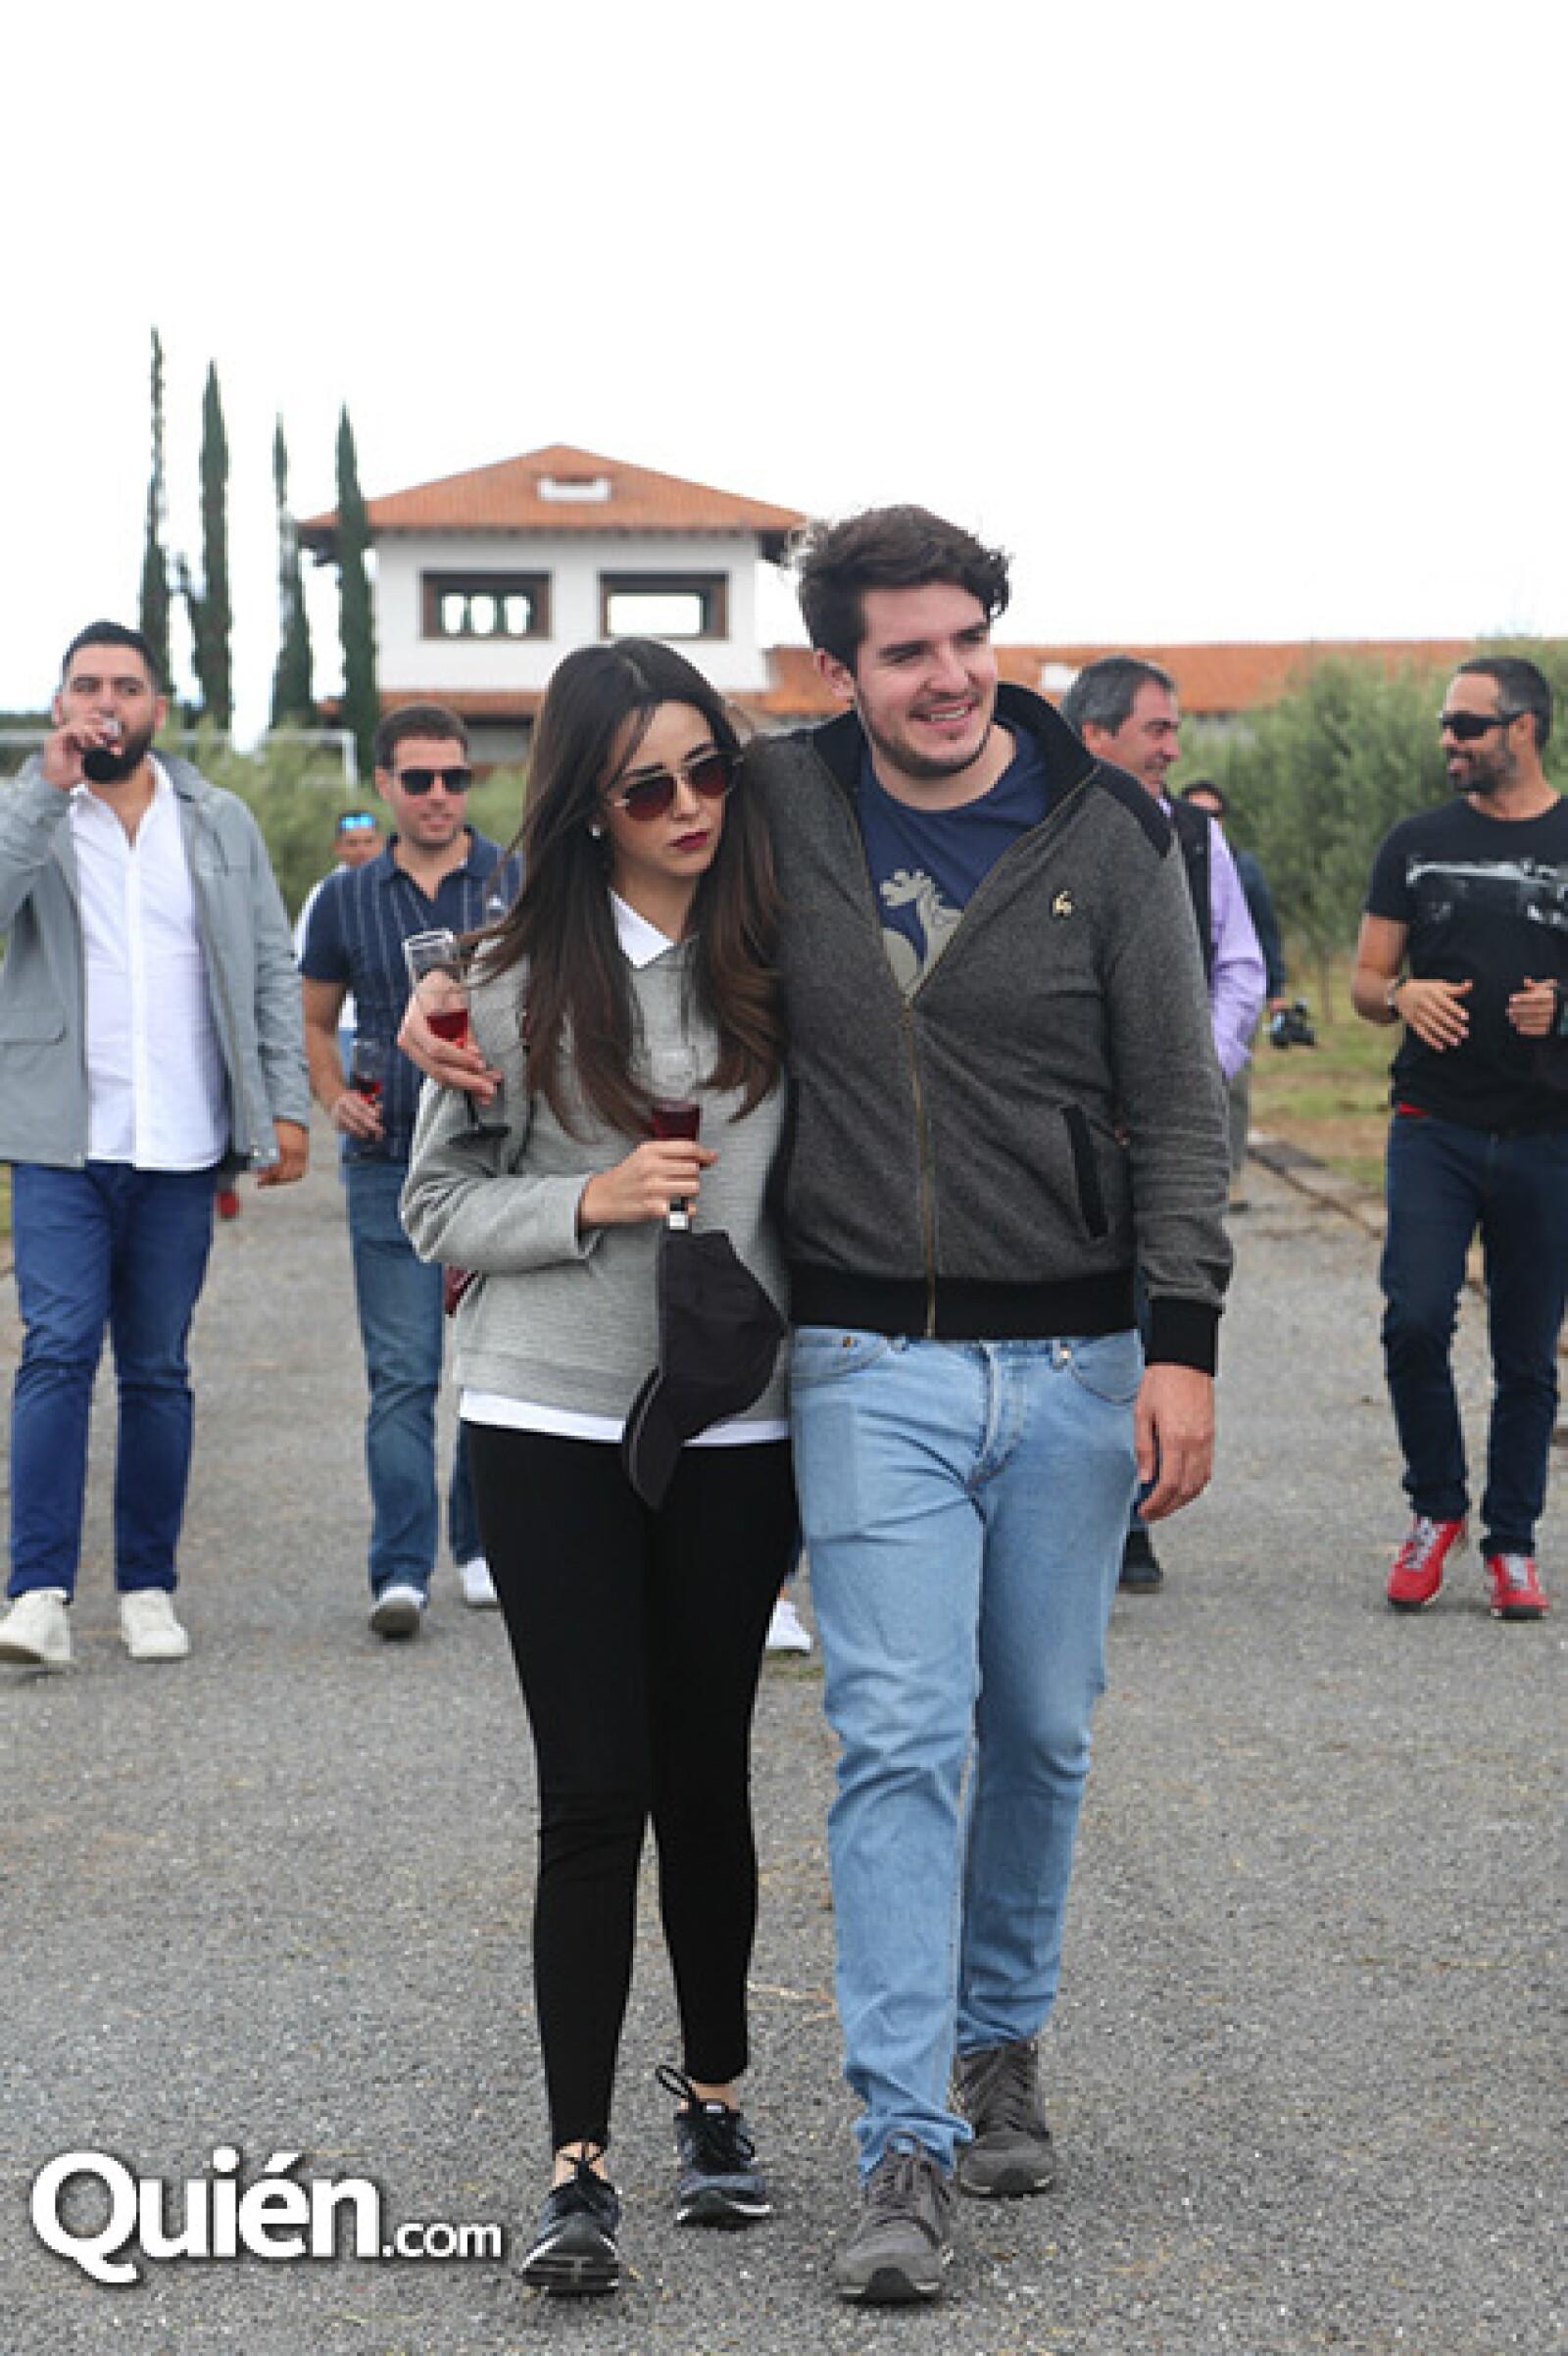 Monique Dupont y Rodrigo Noriega